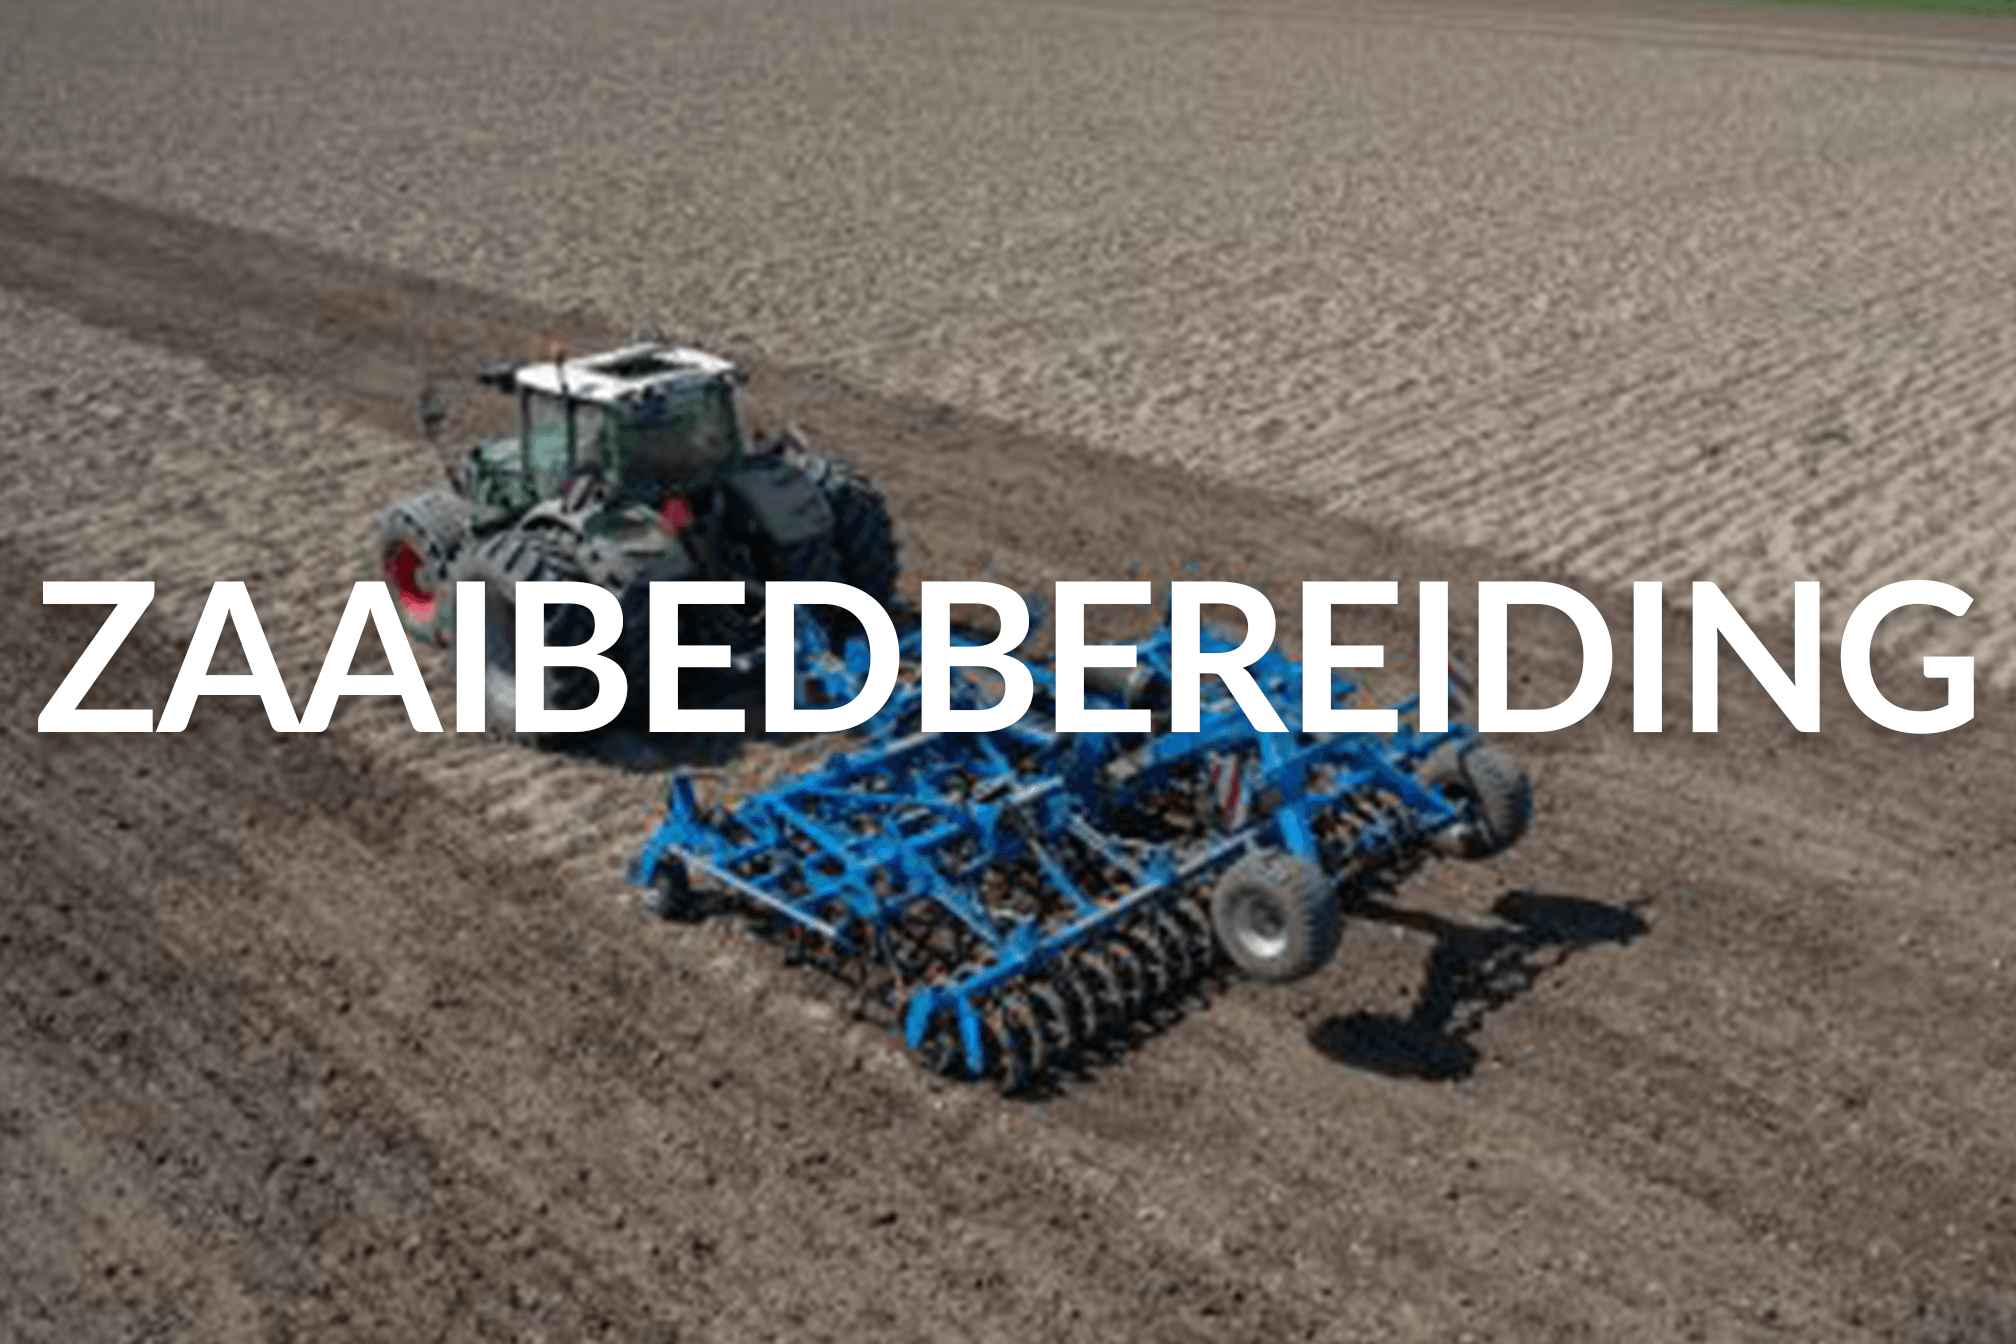 Carré_Zaaibedbereiding_GROOT